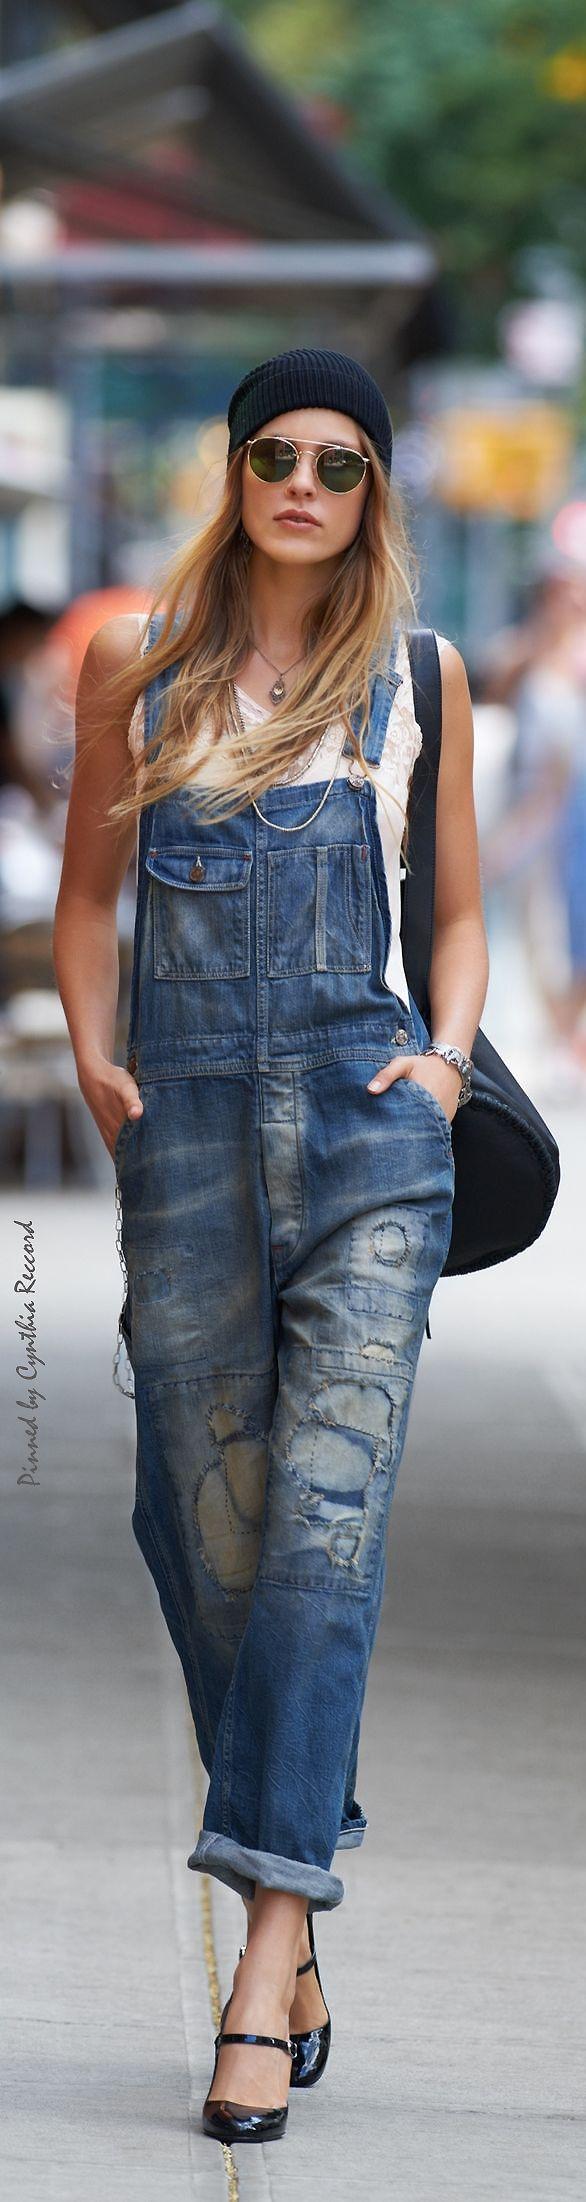 Street Chic | cynthia reccord